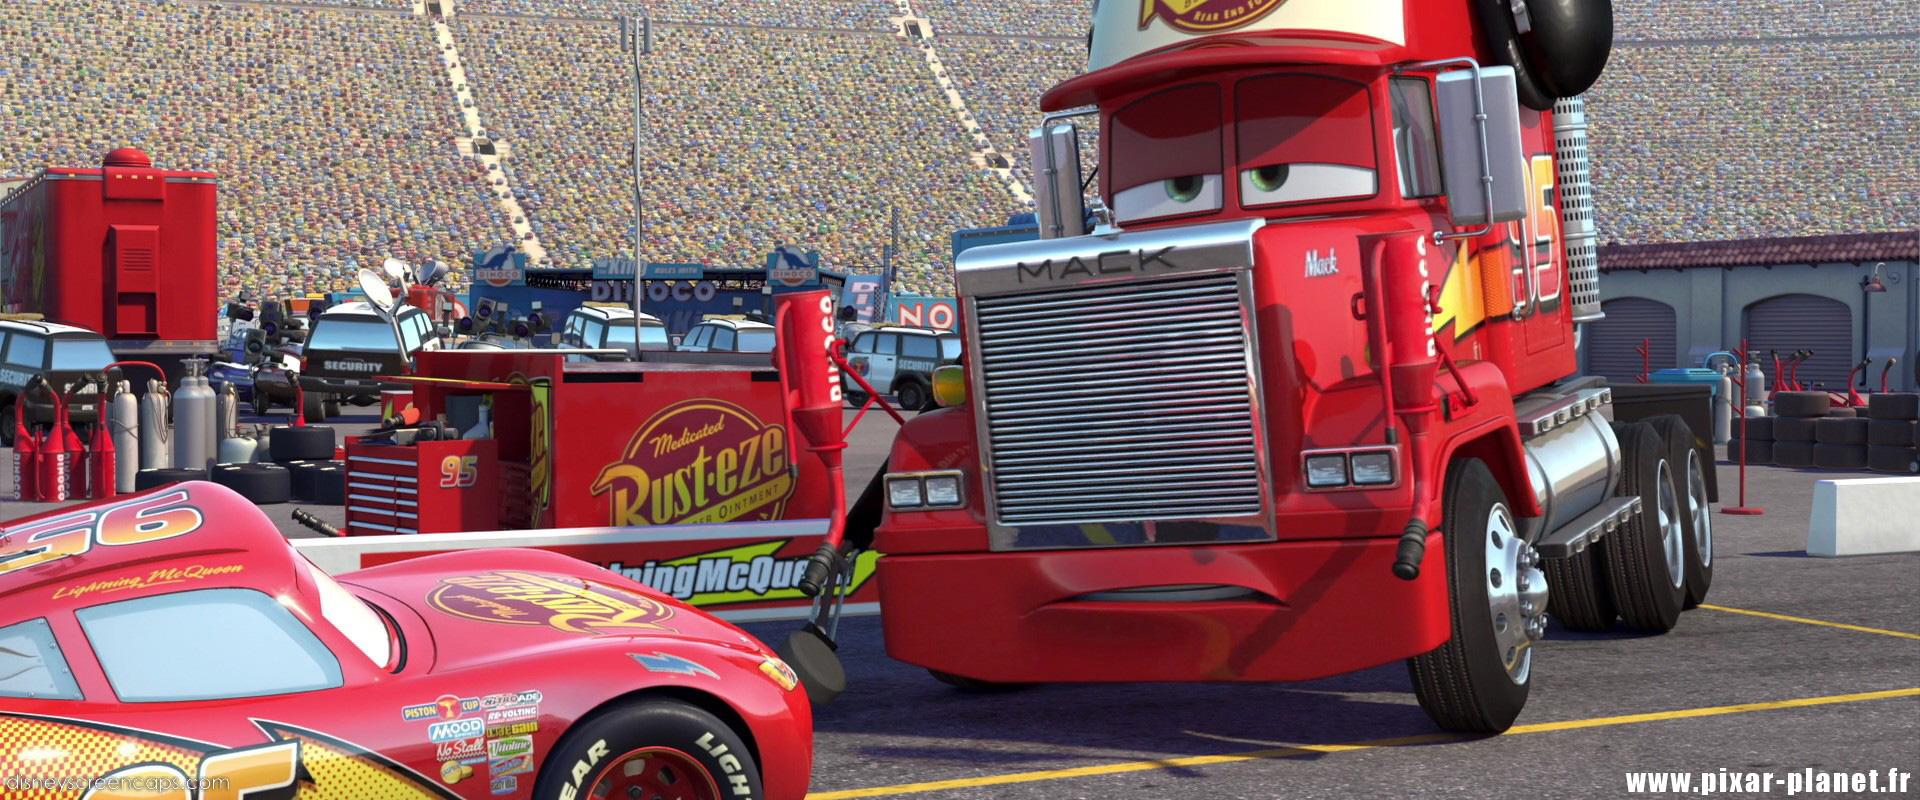 Mack Disney Pixar Cars Photo 40142991 Fanpop